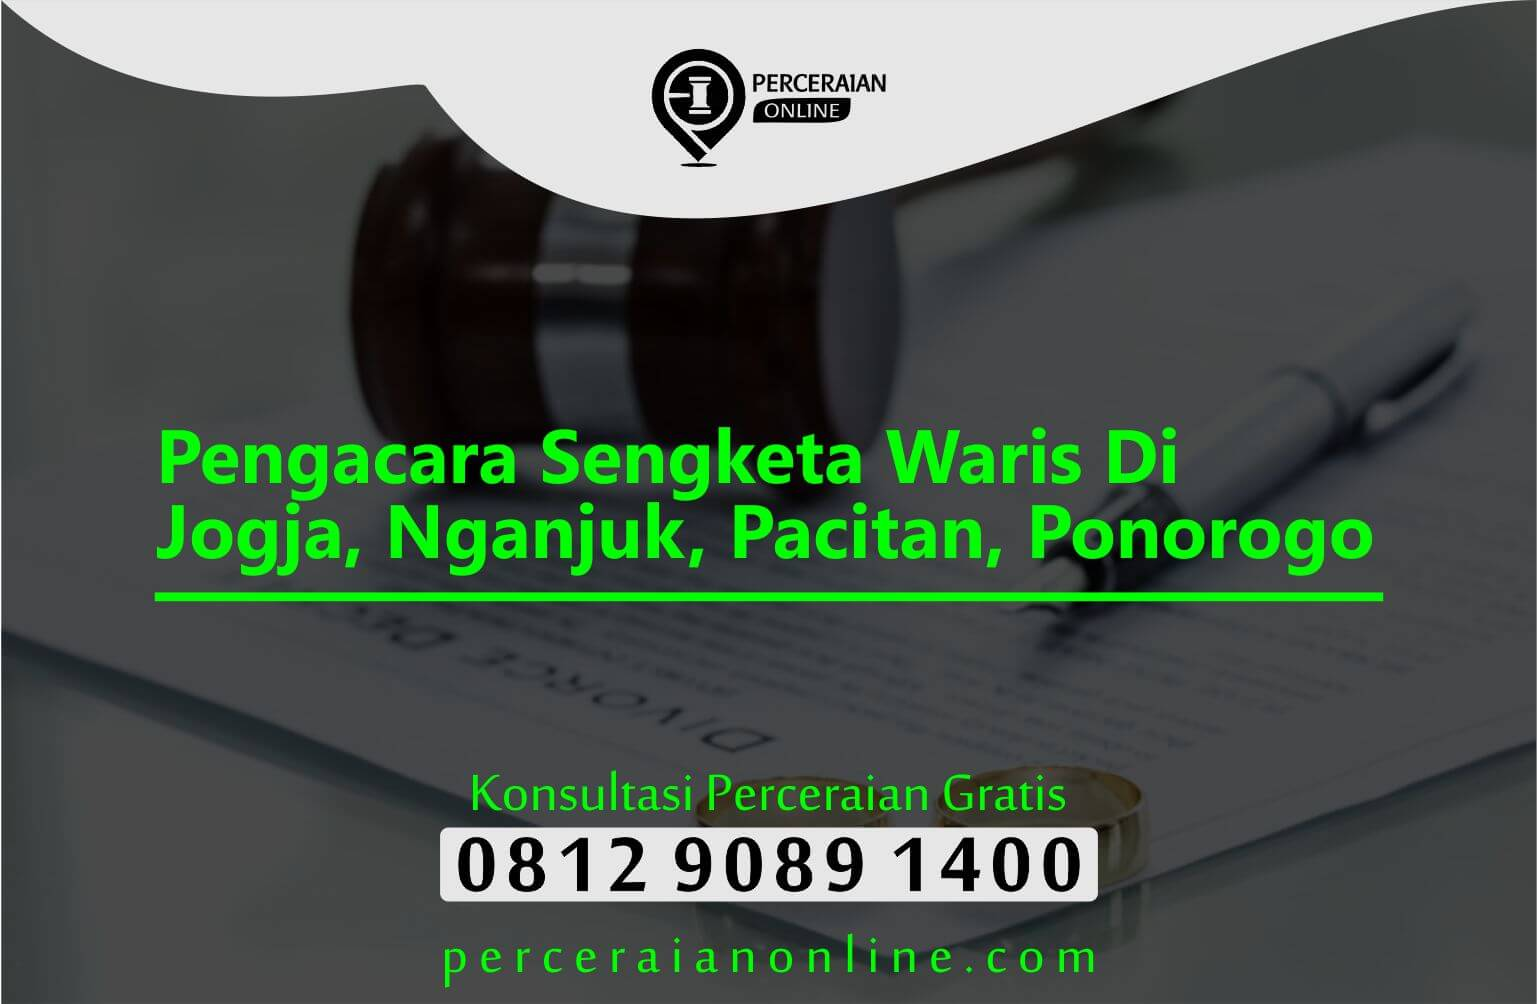 Pengacara Sengketa Waris Di Jogja, Nganjuk, Pacitan, Ponorogo